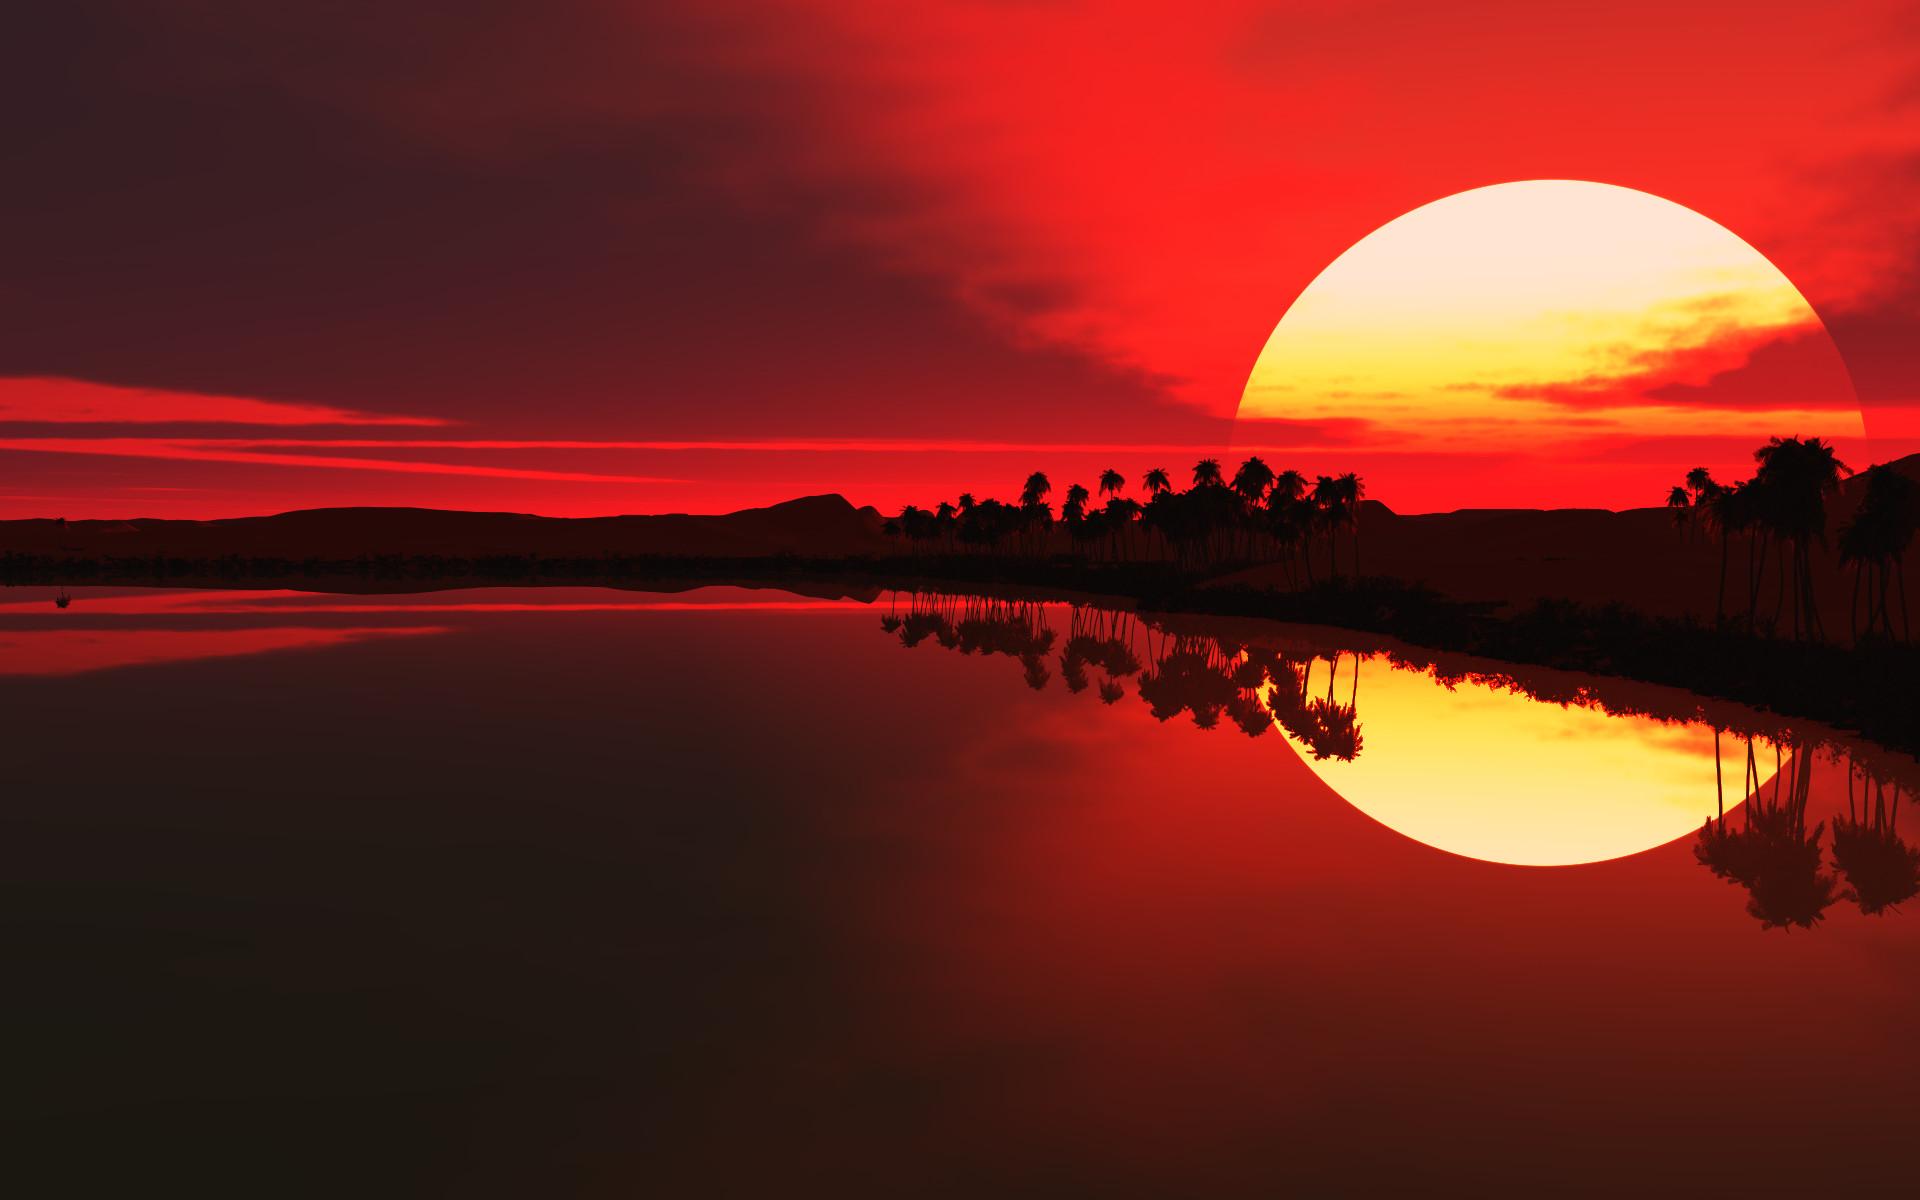 Red sunset artwork